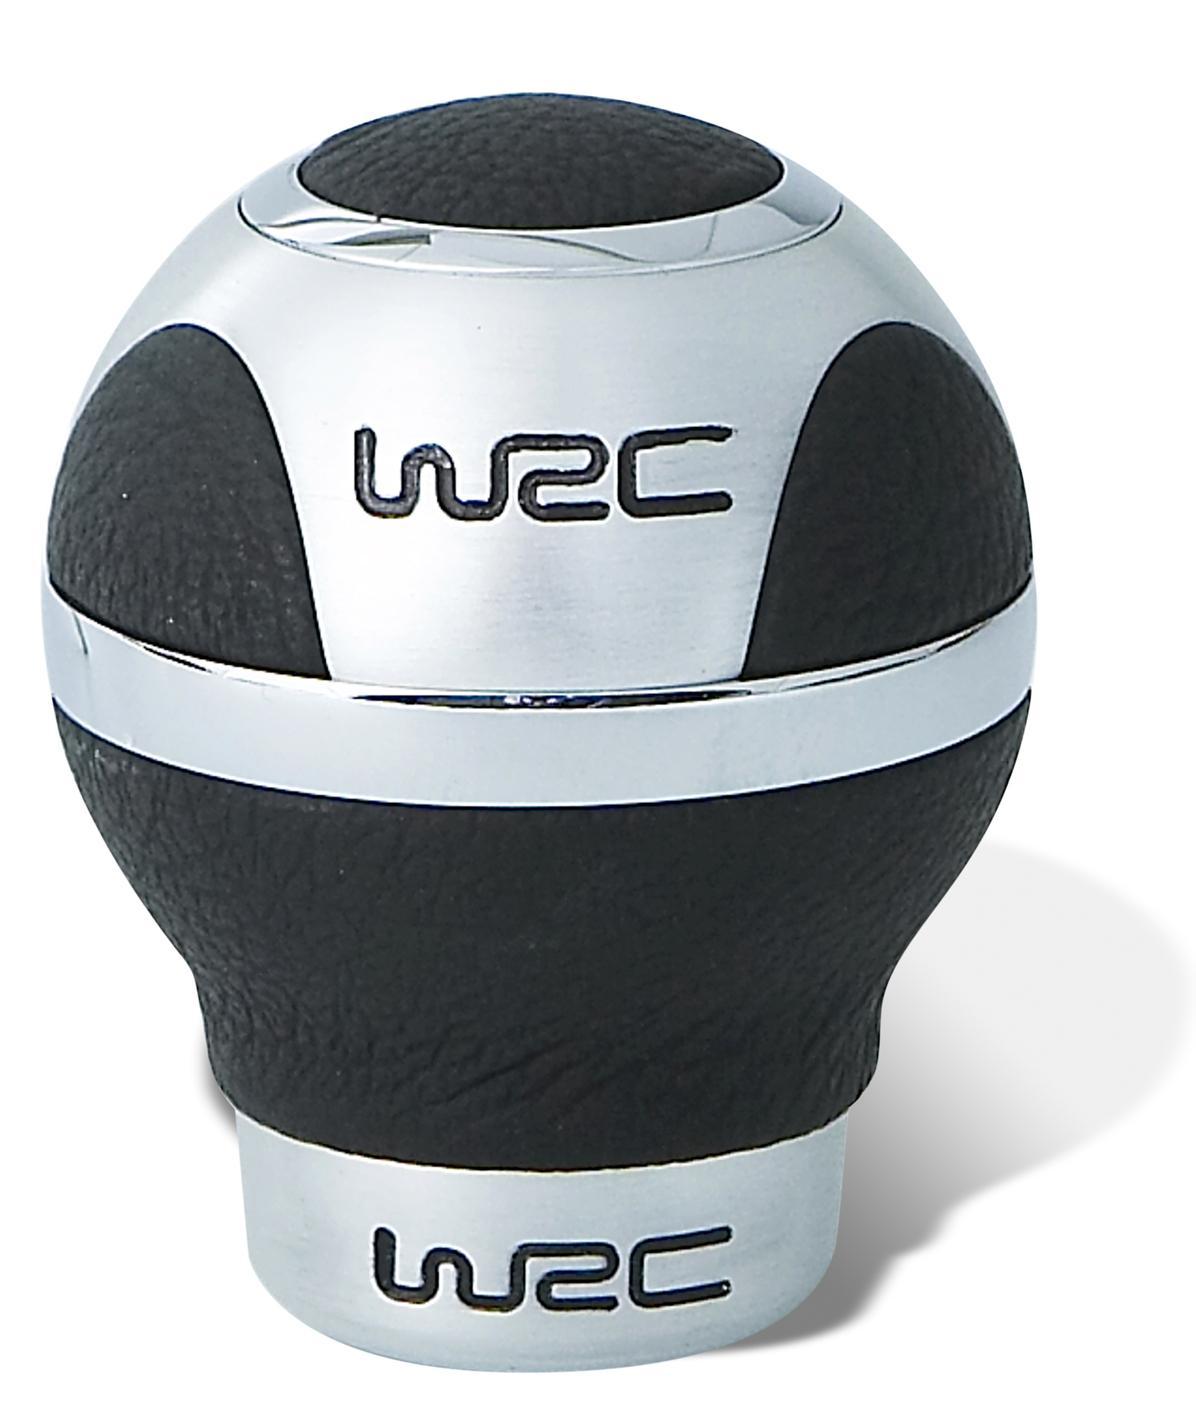 007303 WRC Kunststoff, Universal Schalthebelknauf 007303 kaufen